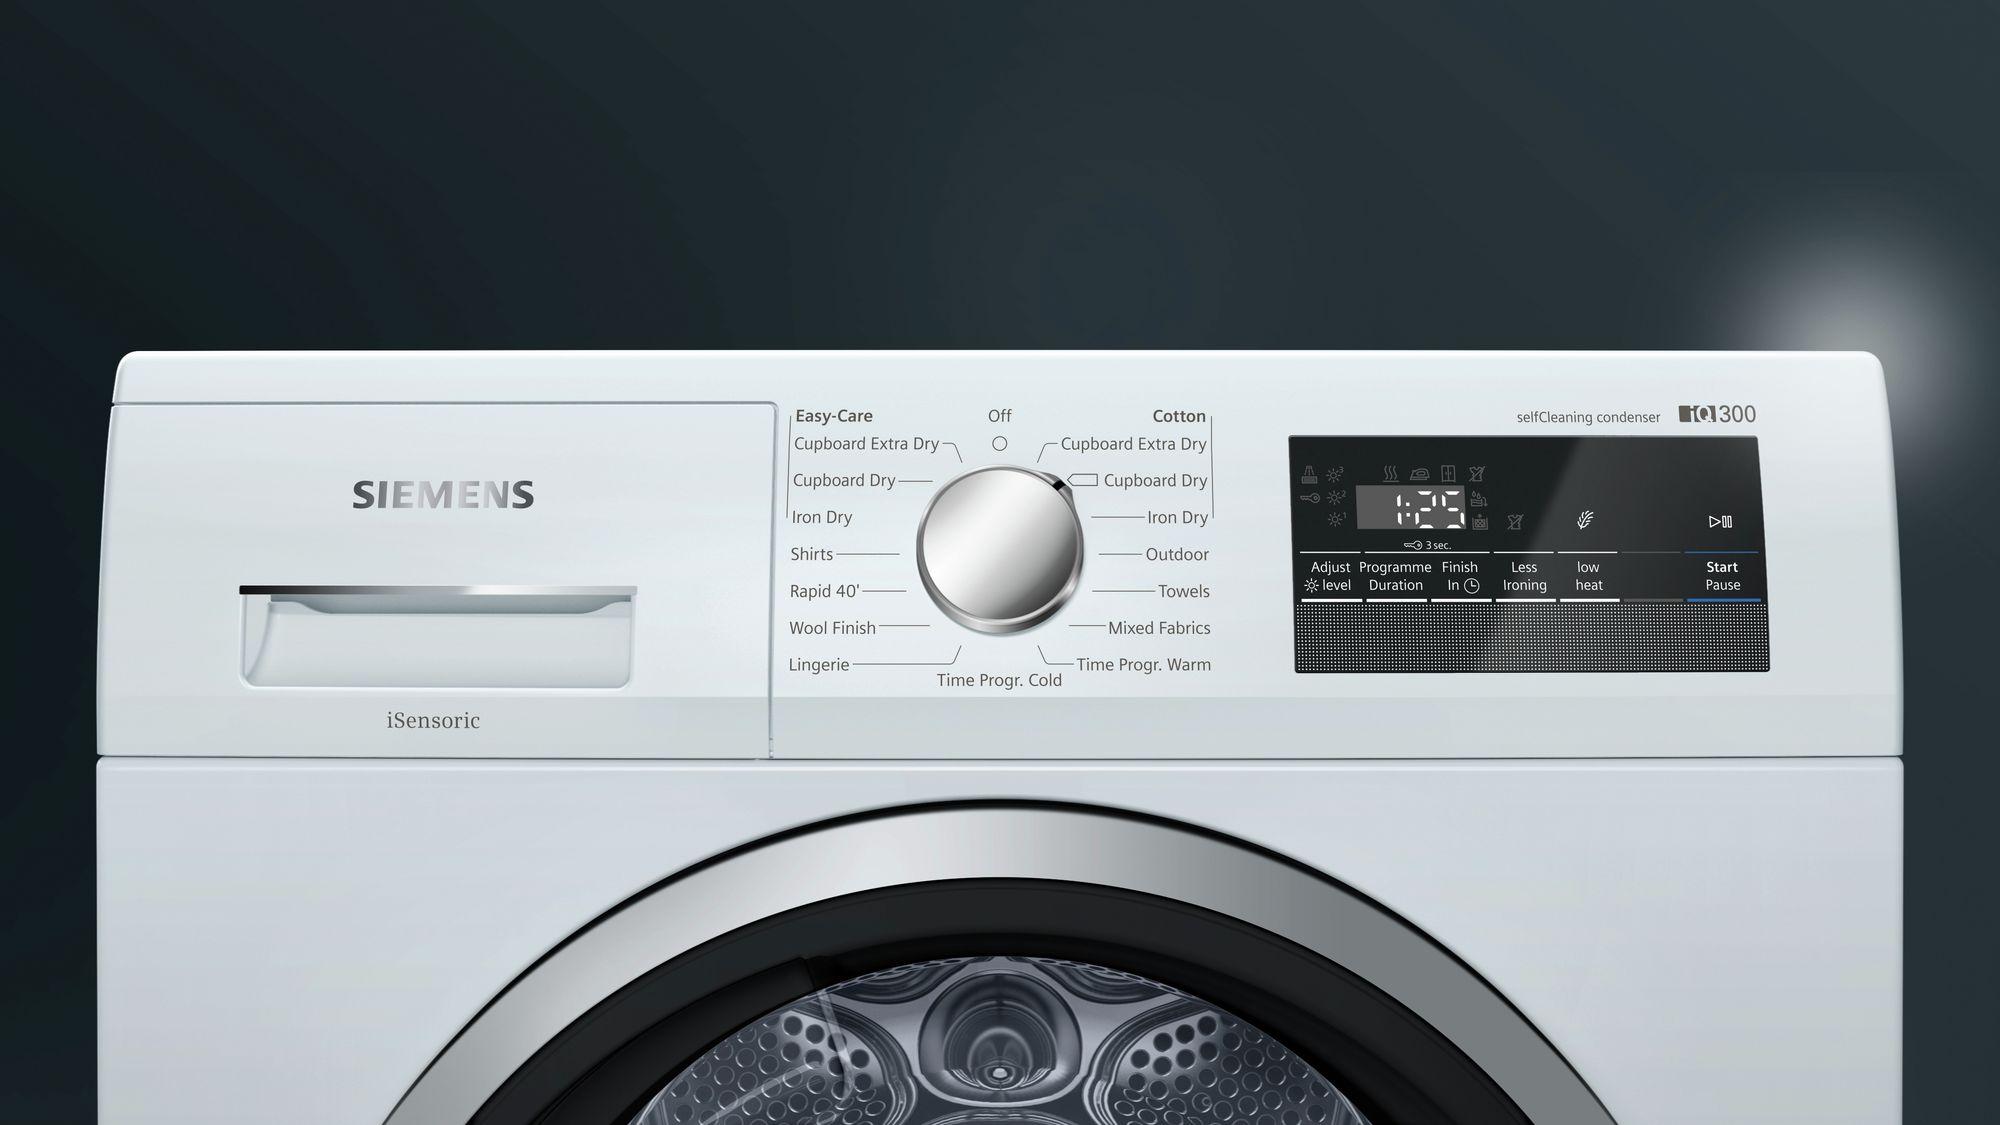 Siemens Iq300 Condenser Tumble Dryer With Heat Pump Wt45m232gb